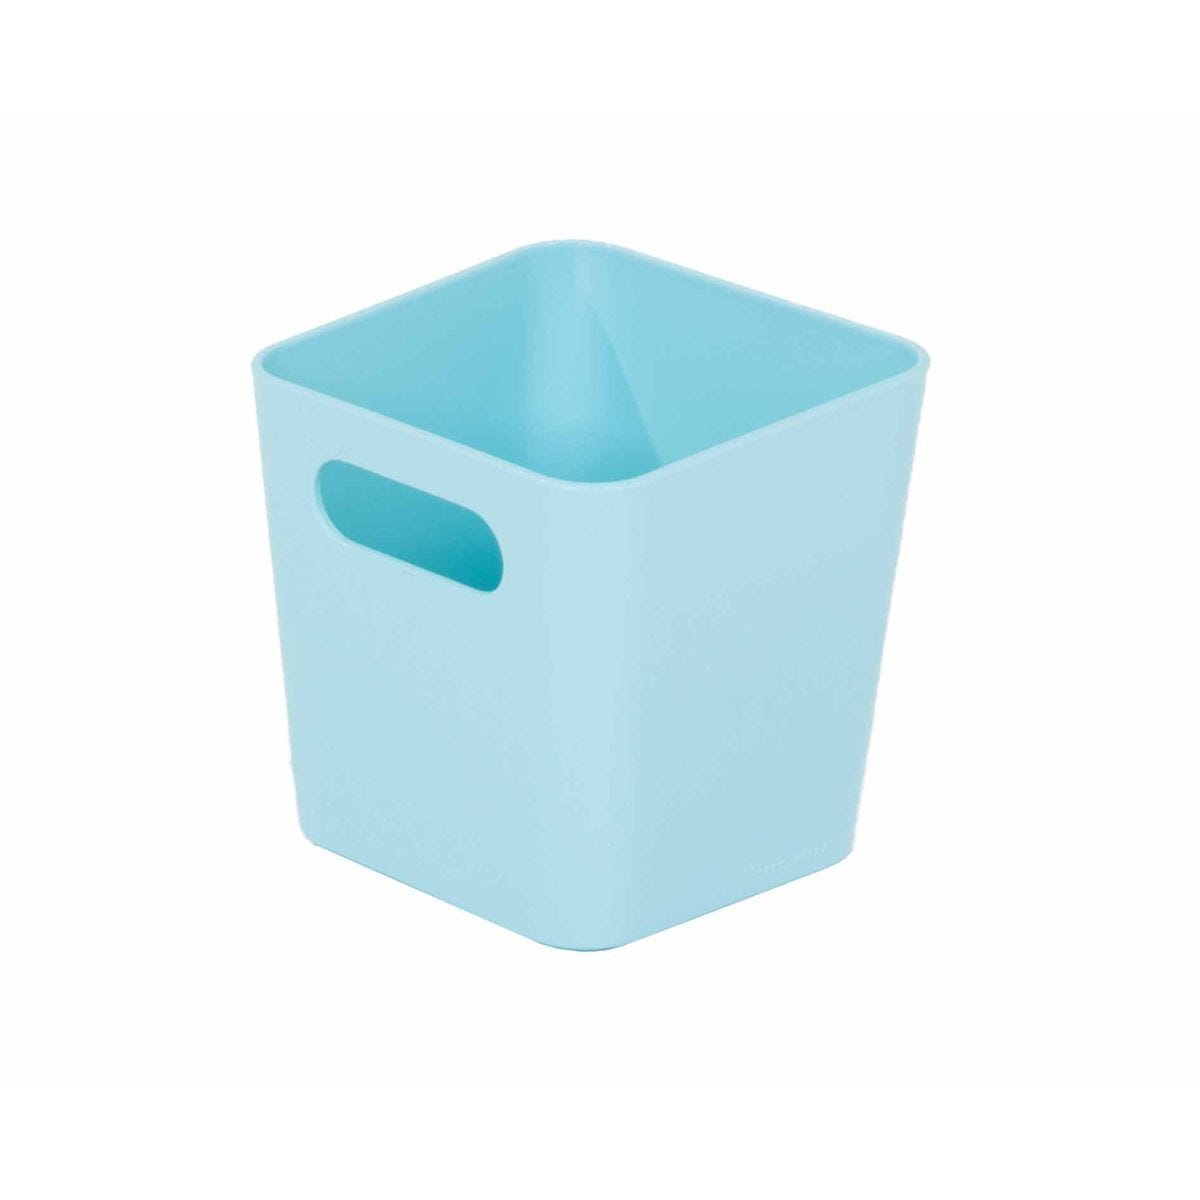 Wham Studio Square Basket 1.01 Pack of 12 Blue